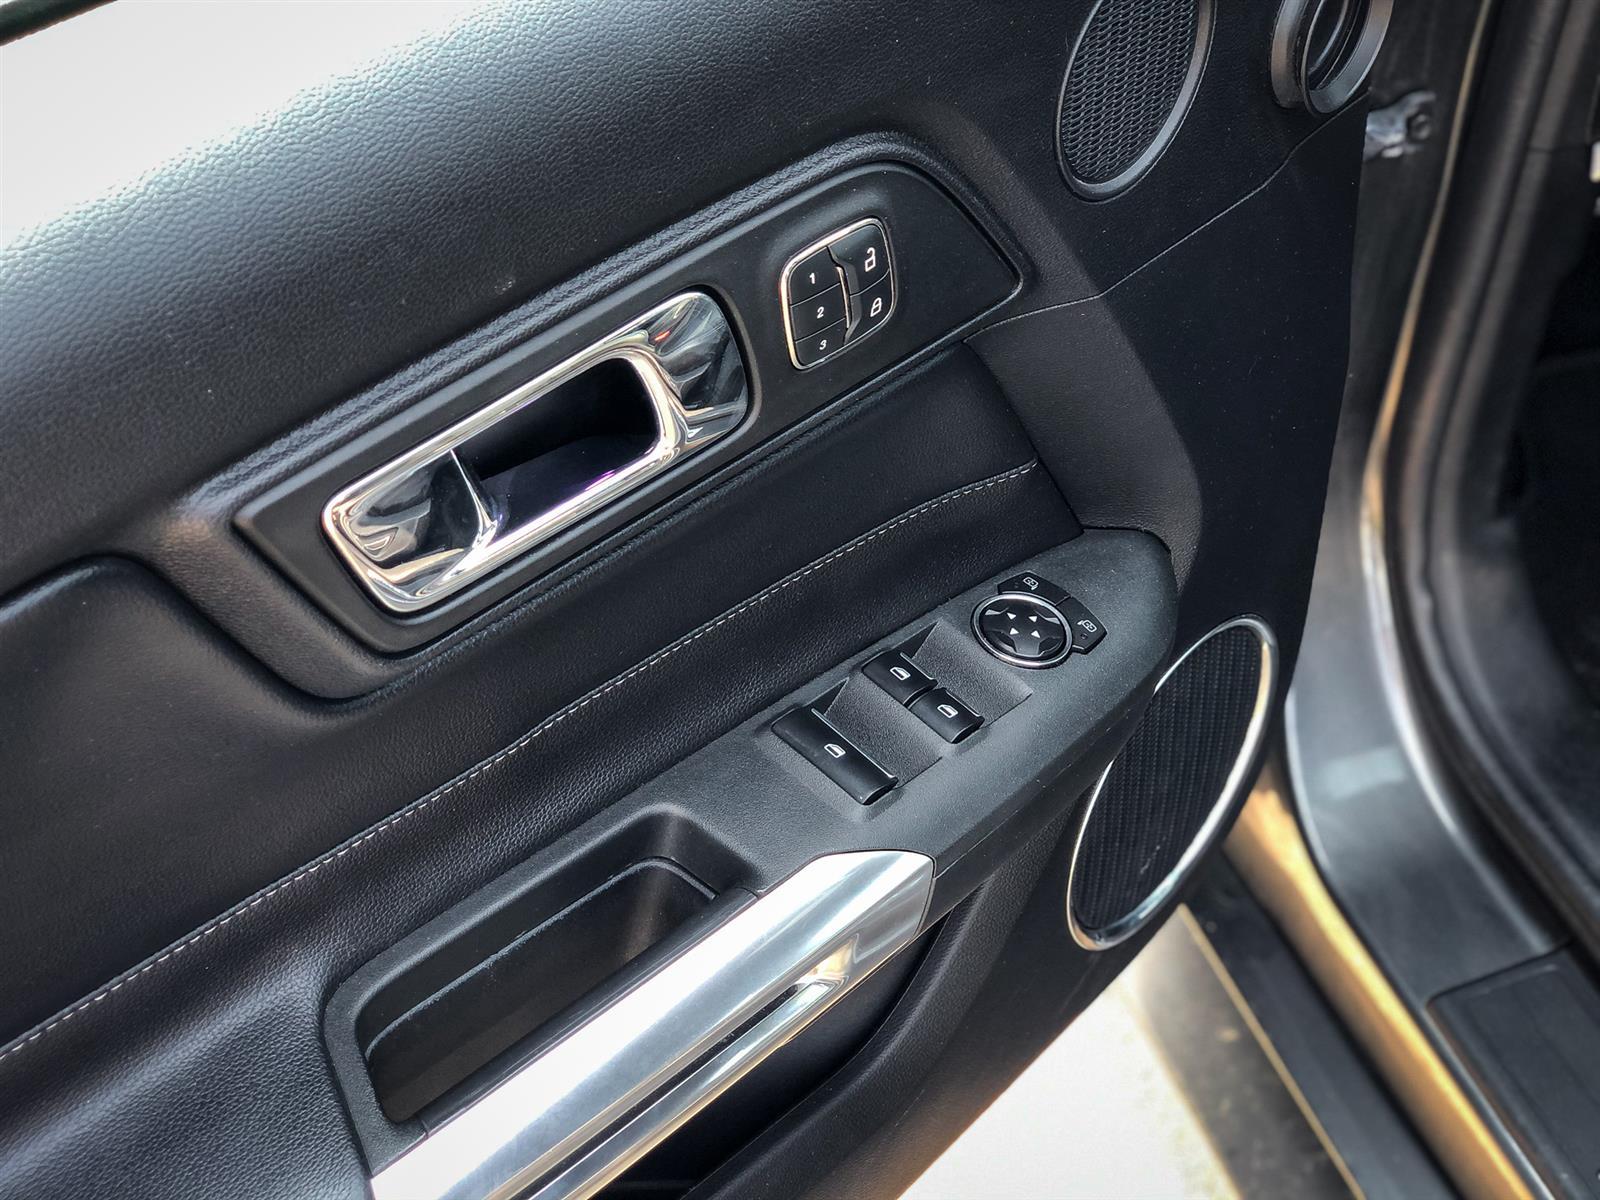 2016 Ford Mustang GT PREMIUM   5.0L V8   RWD   CONVERTIBLE   REVERSE CAMERA